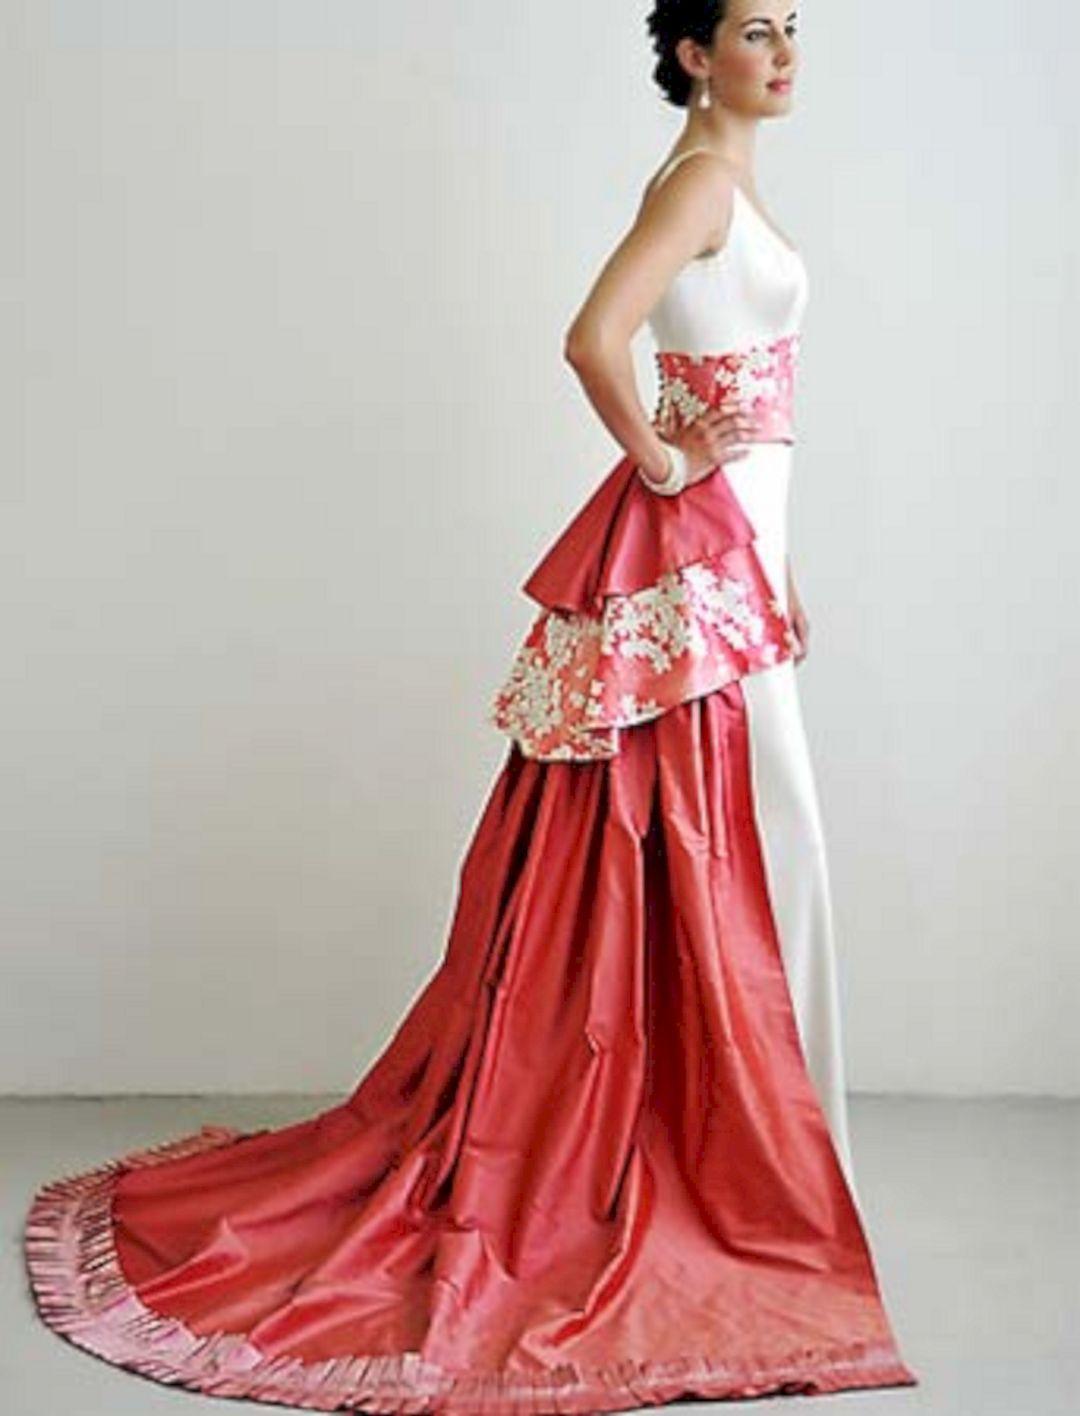 12+ Japanese style dress ideas